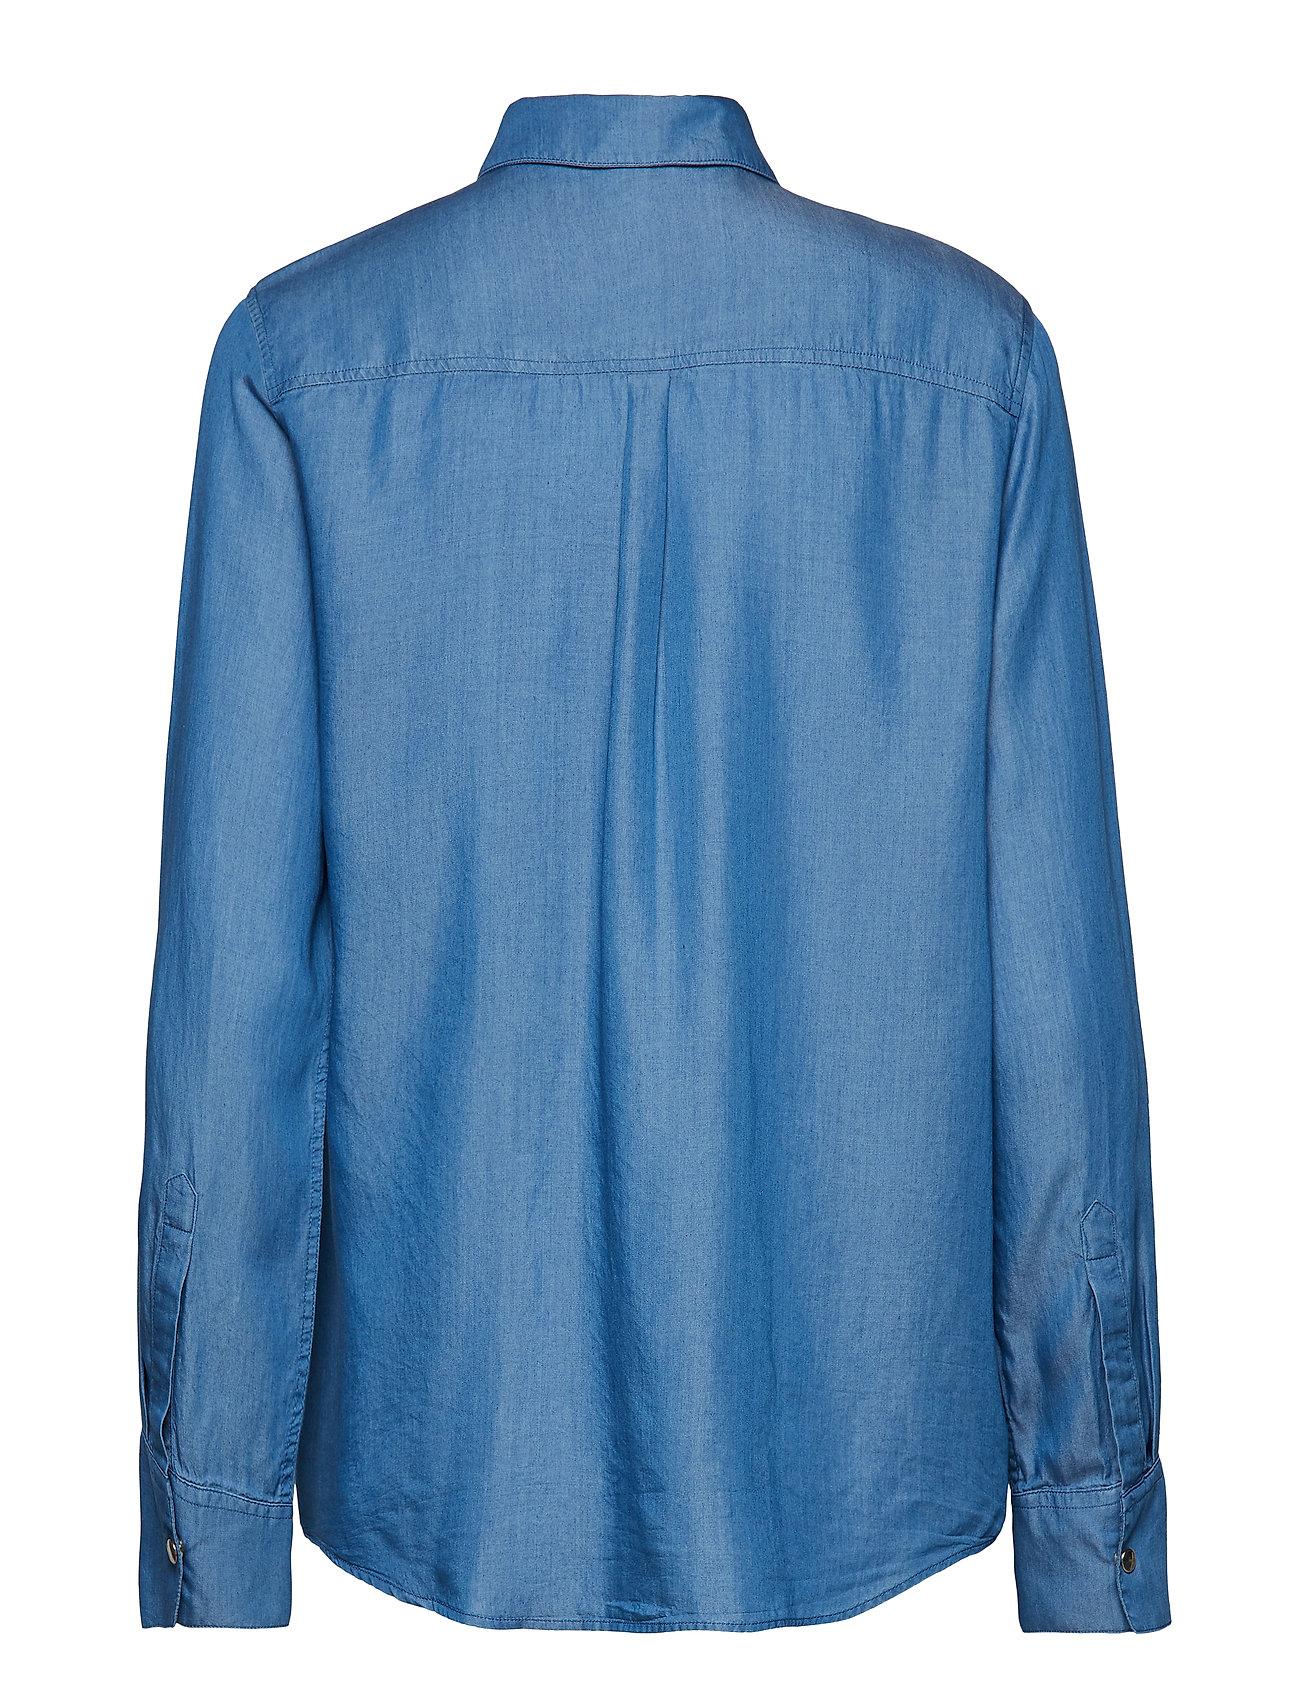 Brax Victoria - Blusar & Skjortor Sky Blue